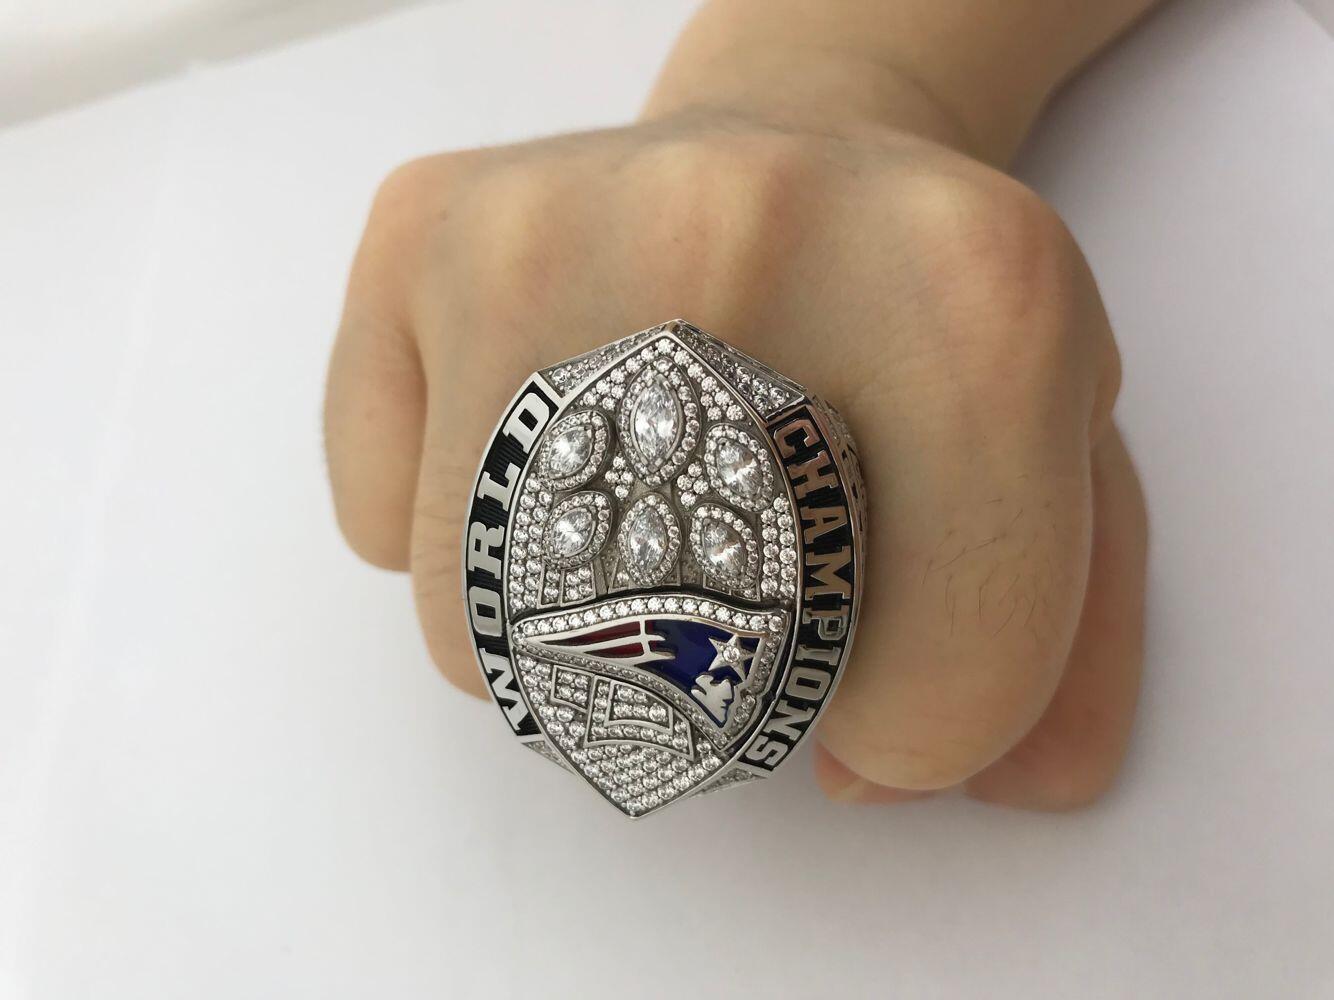 New England Patriots Nfl Super Bowl Championship Ring